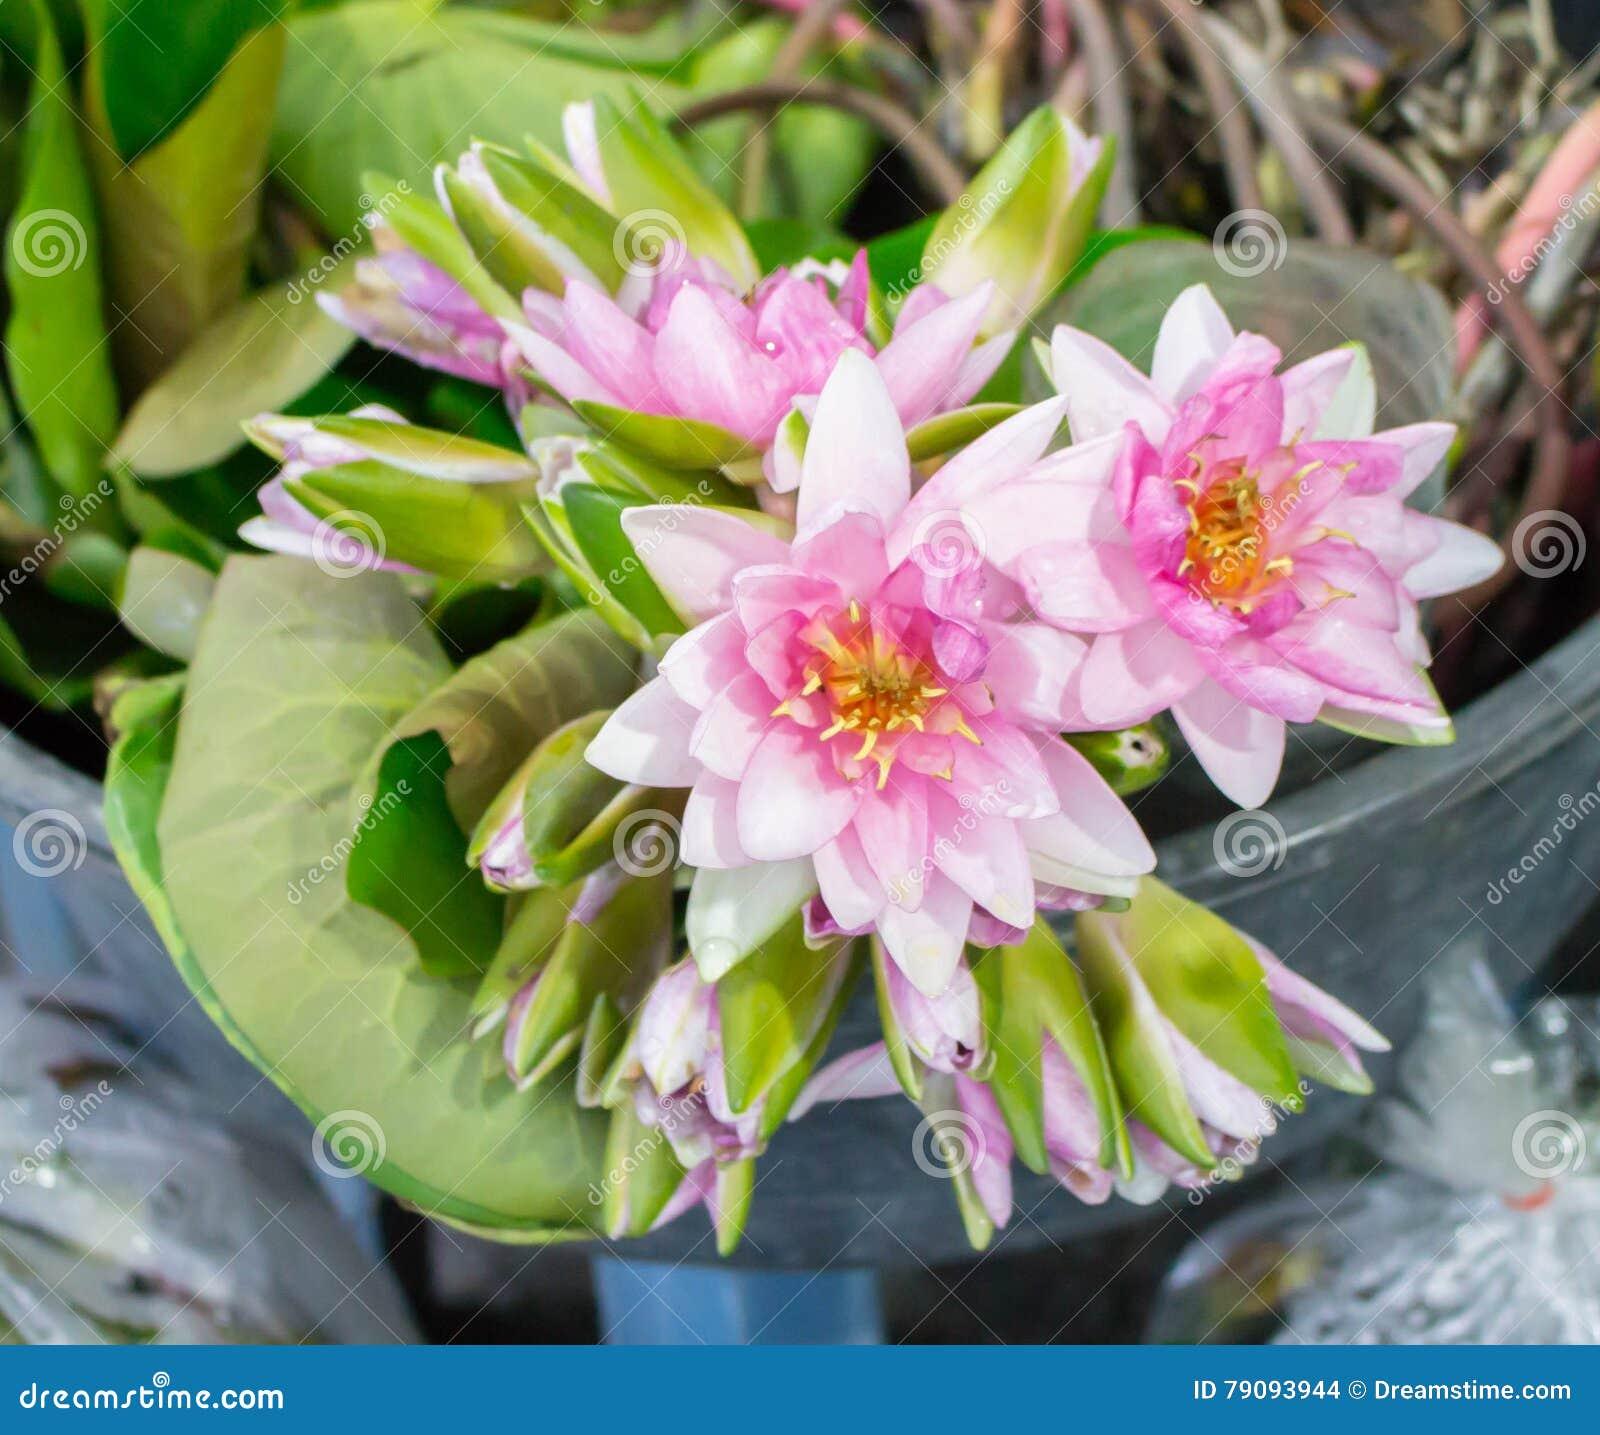 Beautiful Multi White-pink Waterlily Or Lotus Flower Stock Photo ...